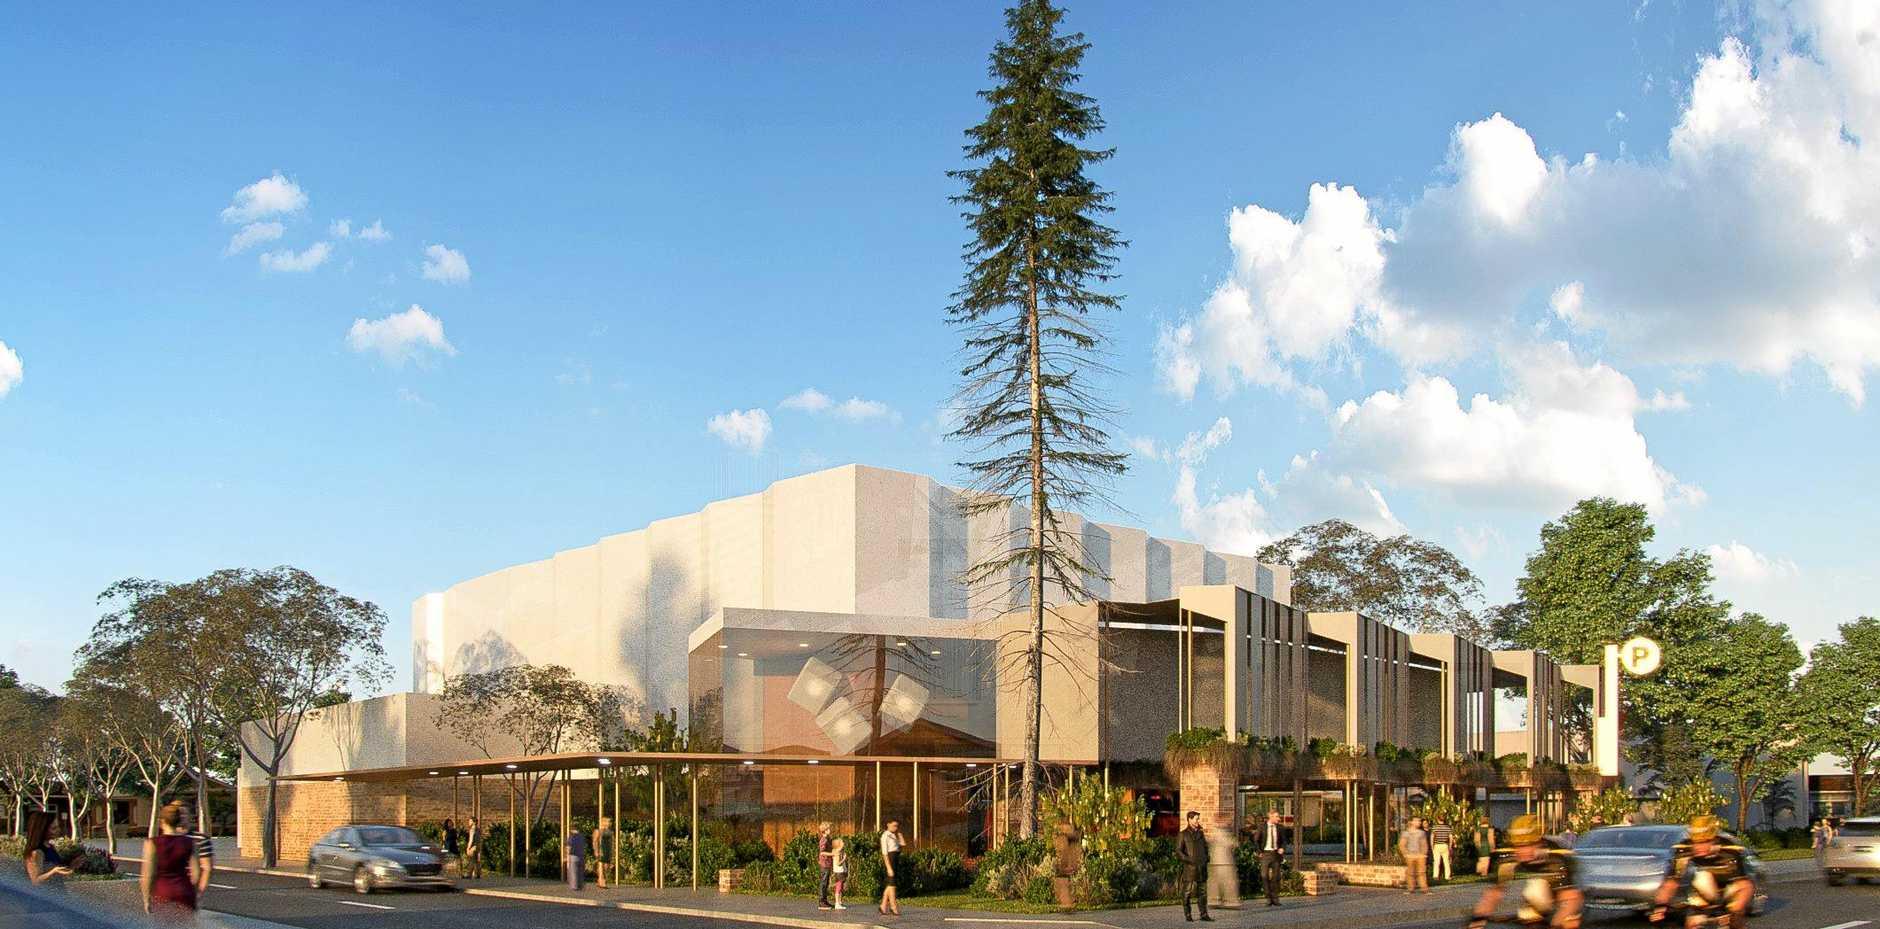 SLICK: A design for the new Proserpine Entertainment Centre.